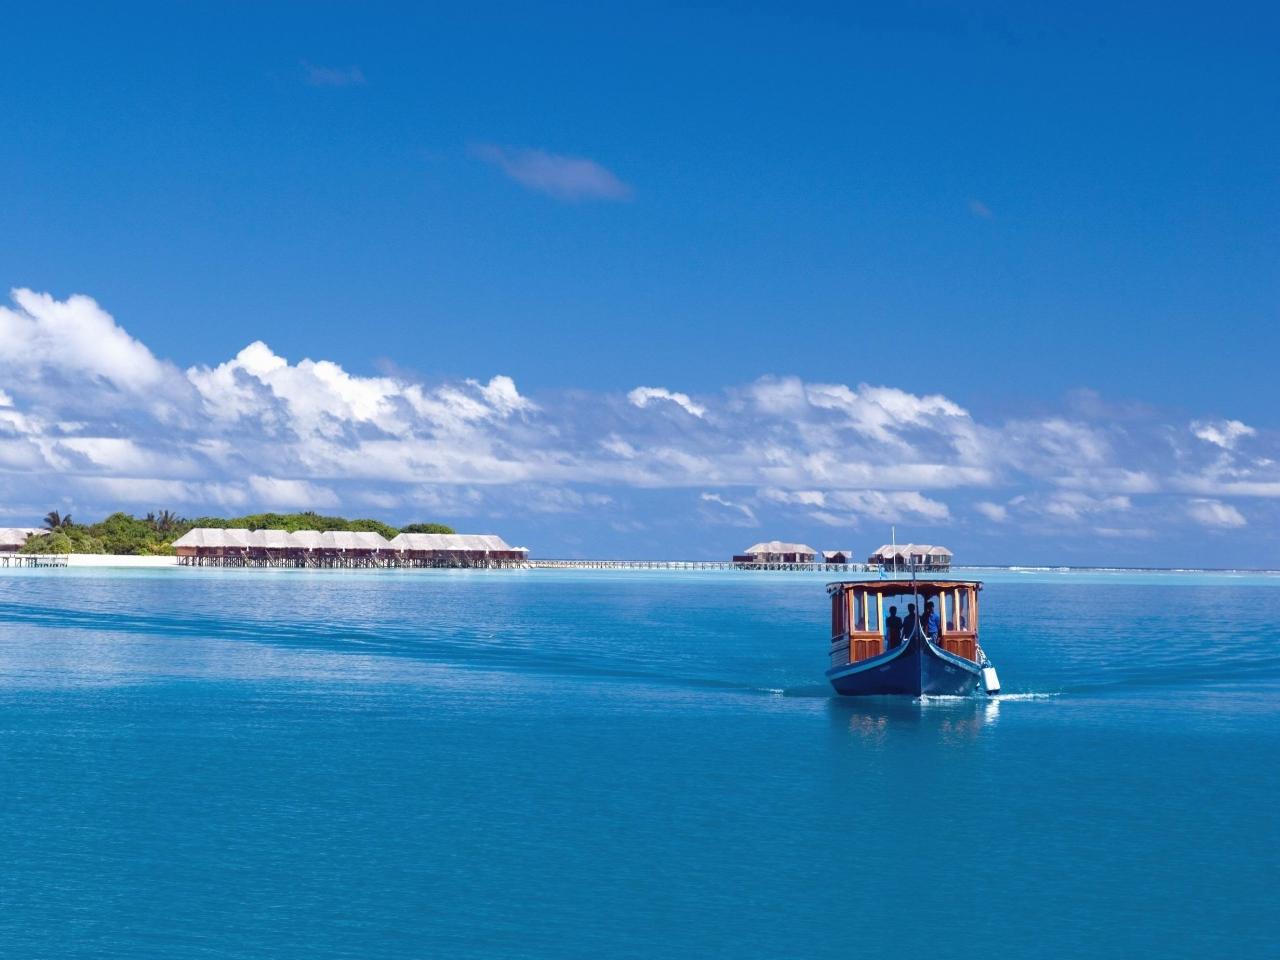 maldives-tropics-sea-island-boat.jpg